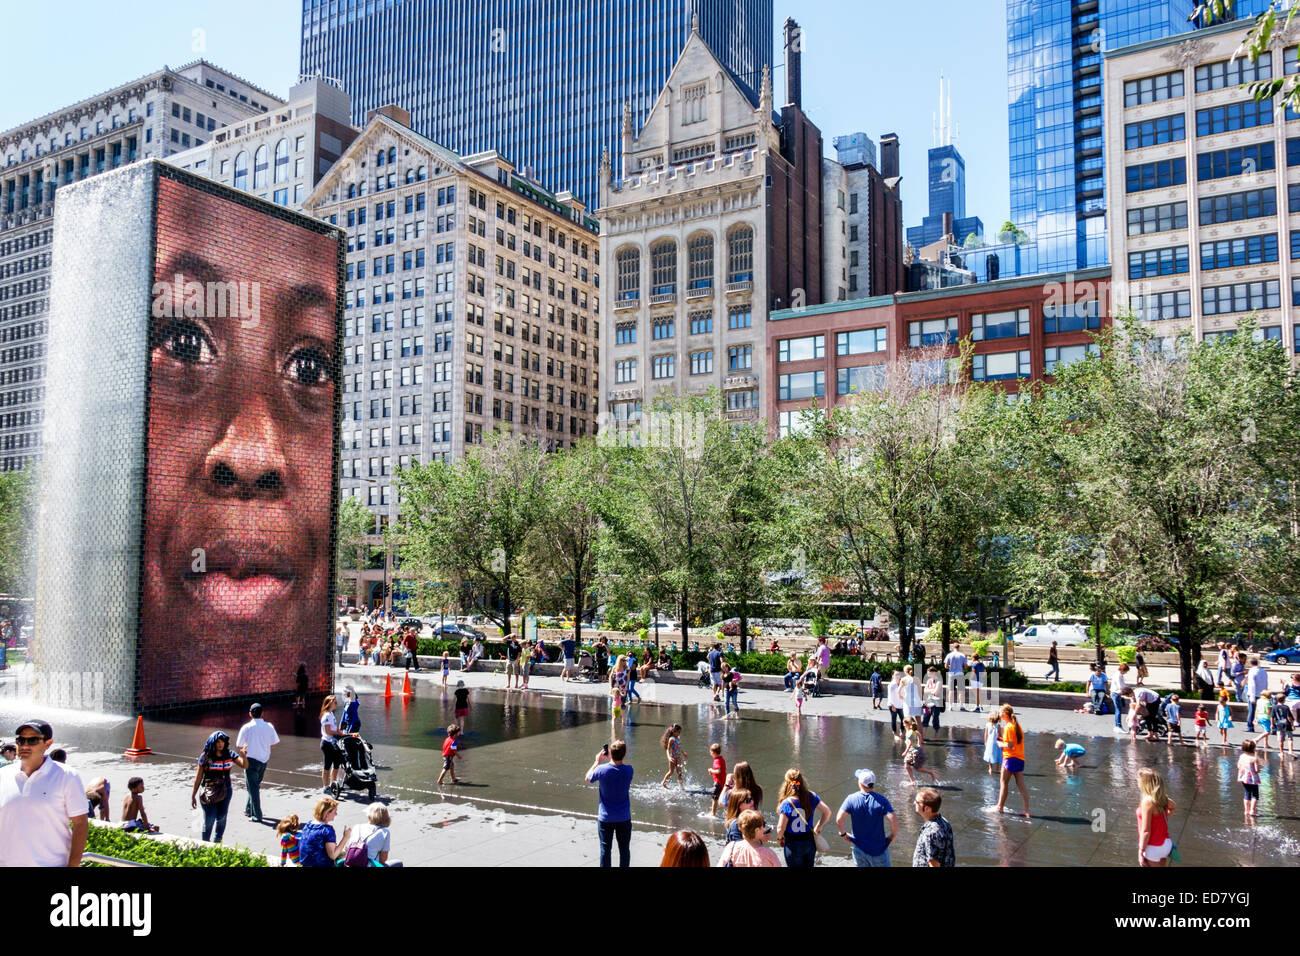 Chicago Illinois Loop Millennium Park Crown Fountain reflecting pool North Michigan Avenue city skyline skyscrapers - Stock Image